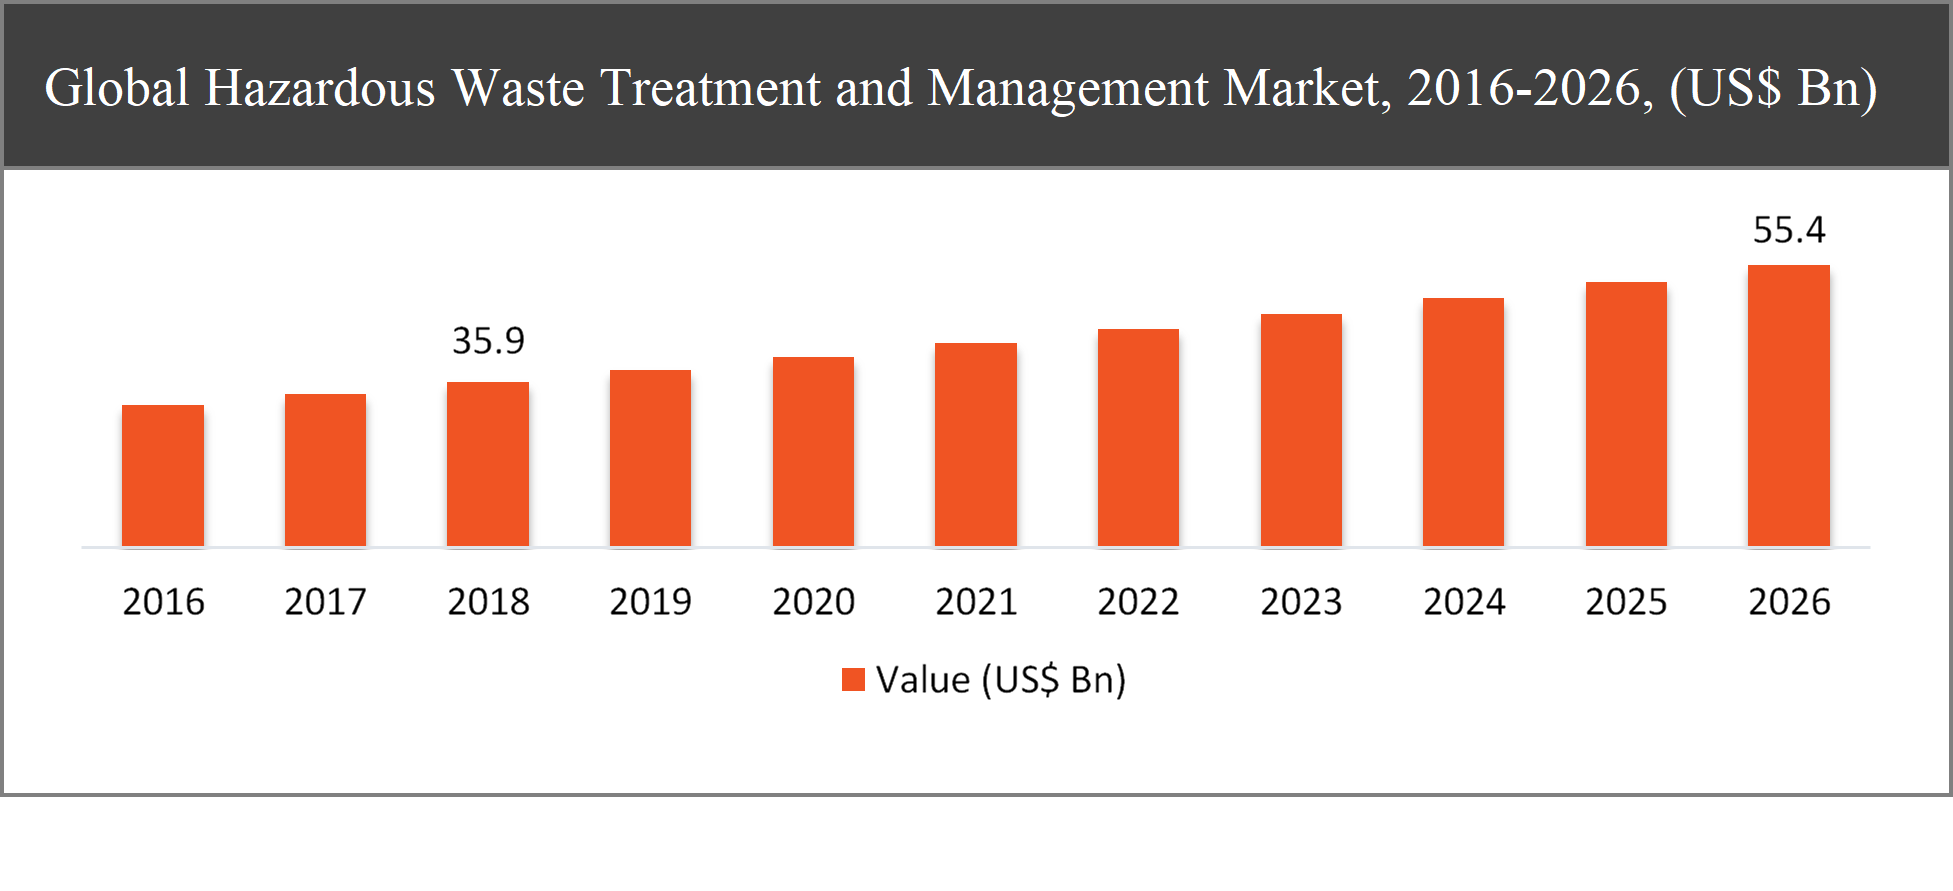 Hazardous Waste Treatment and Management Market